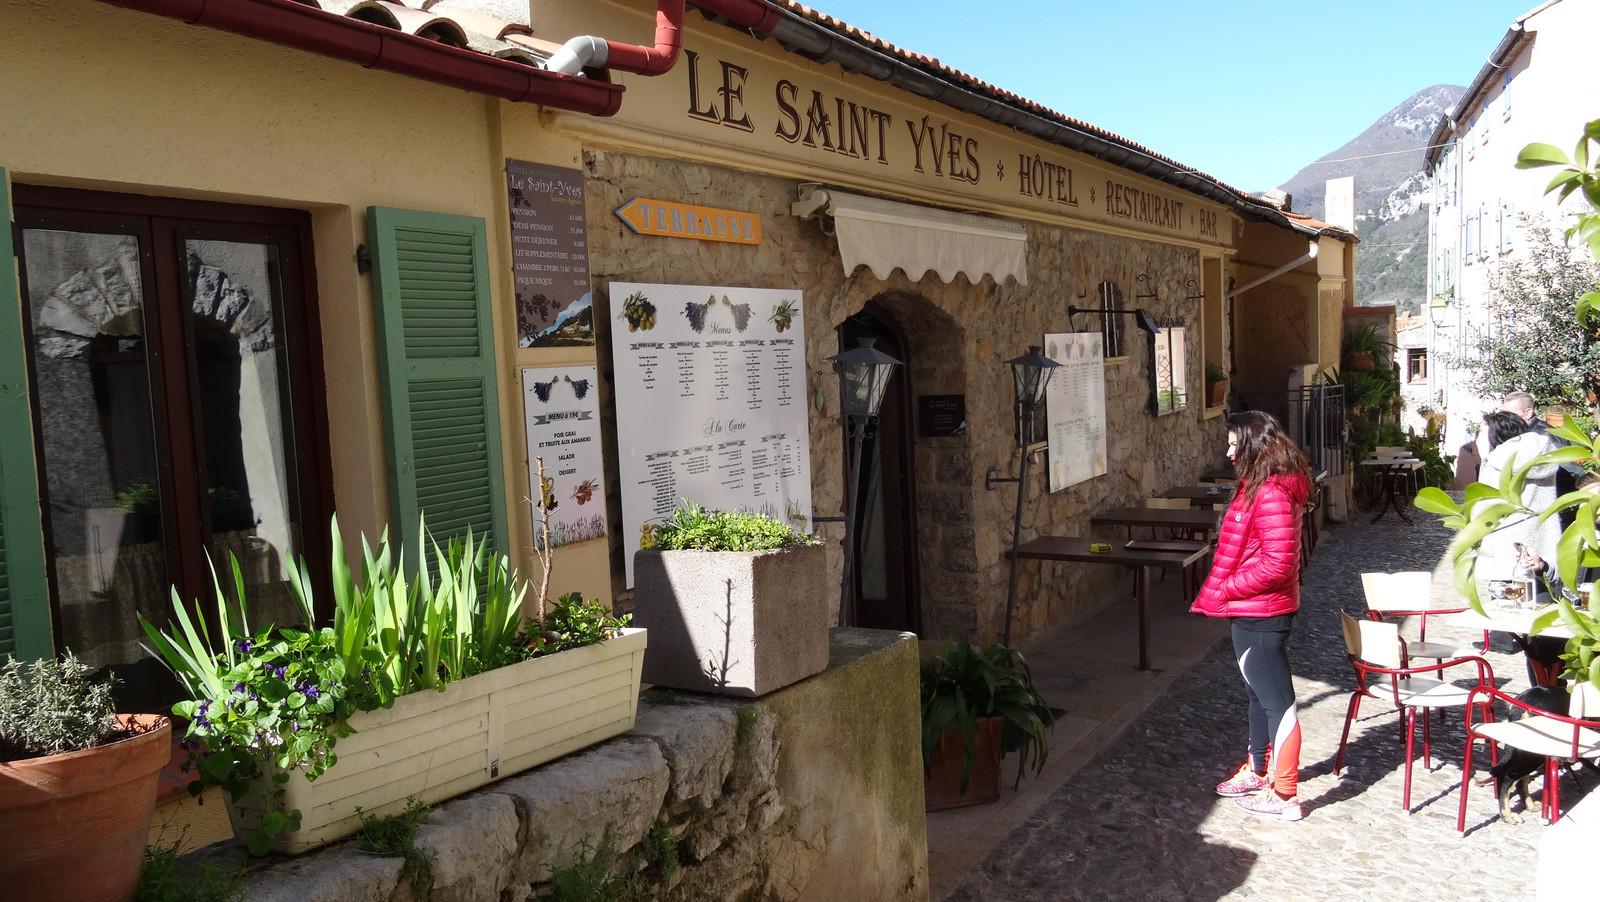 ... le Saint Yves ... entrons ...